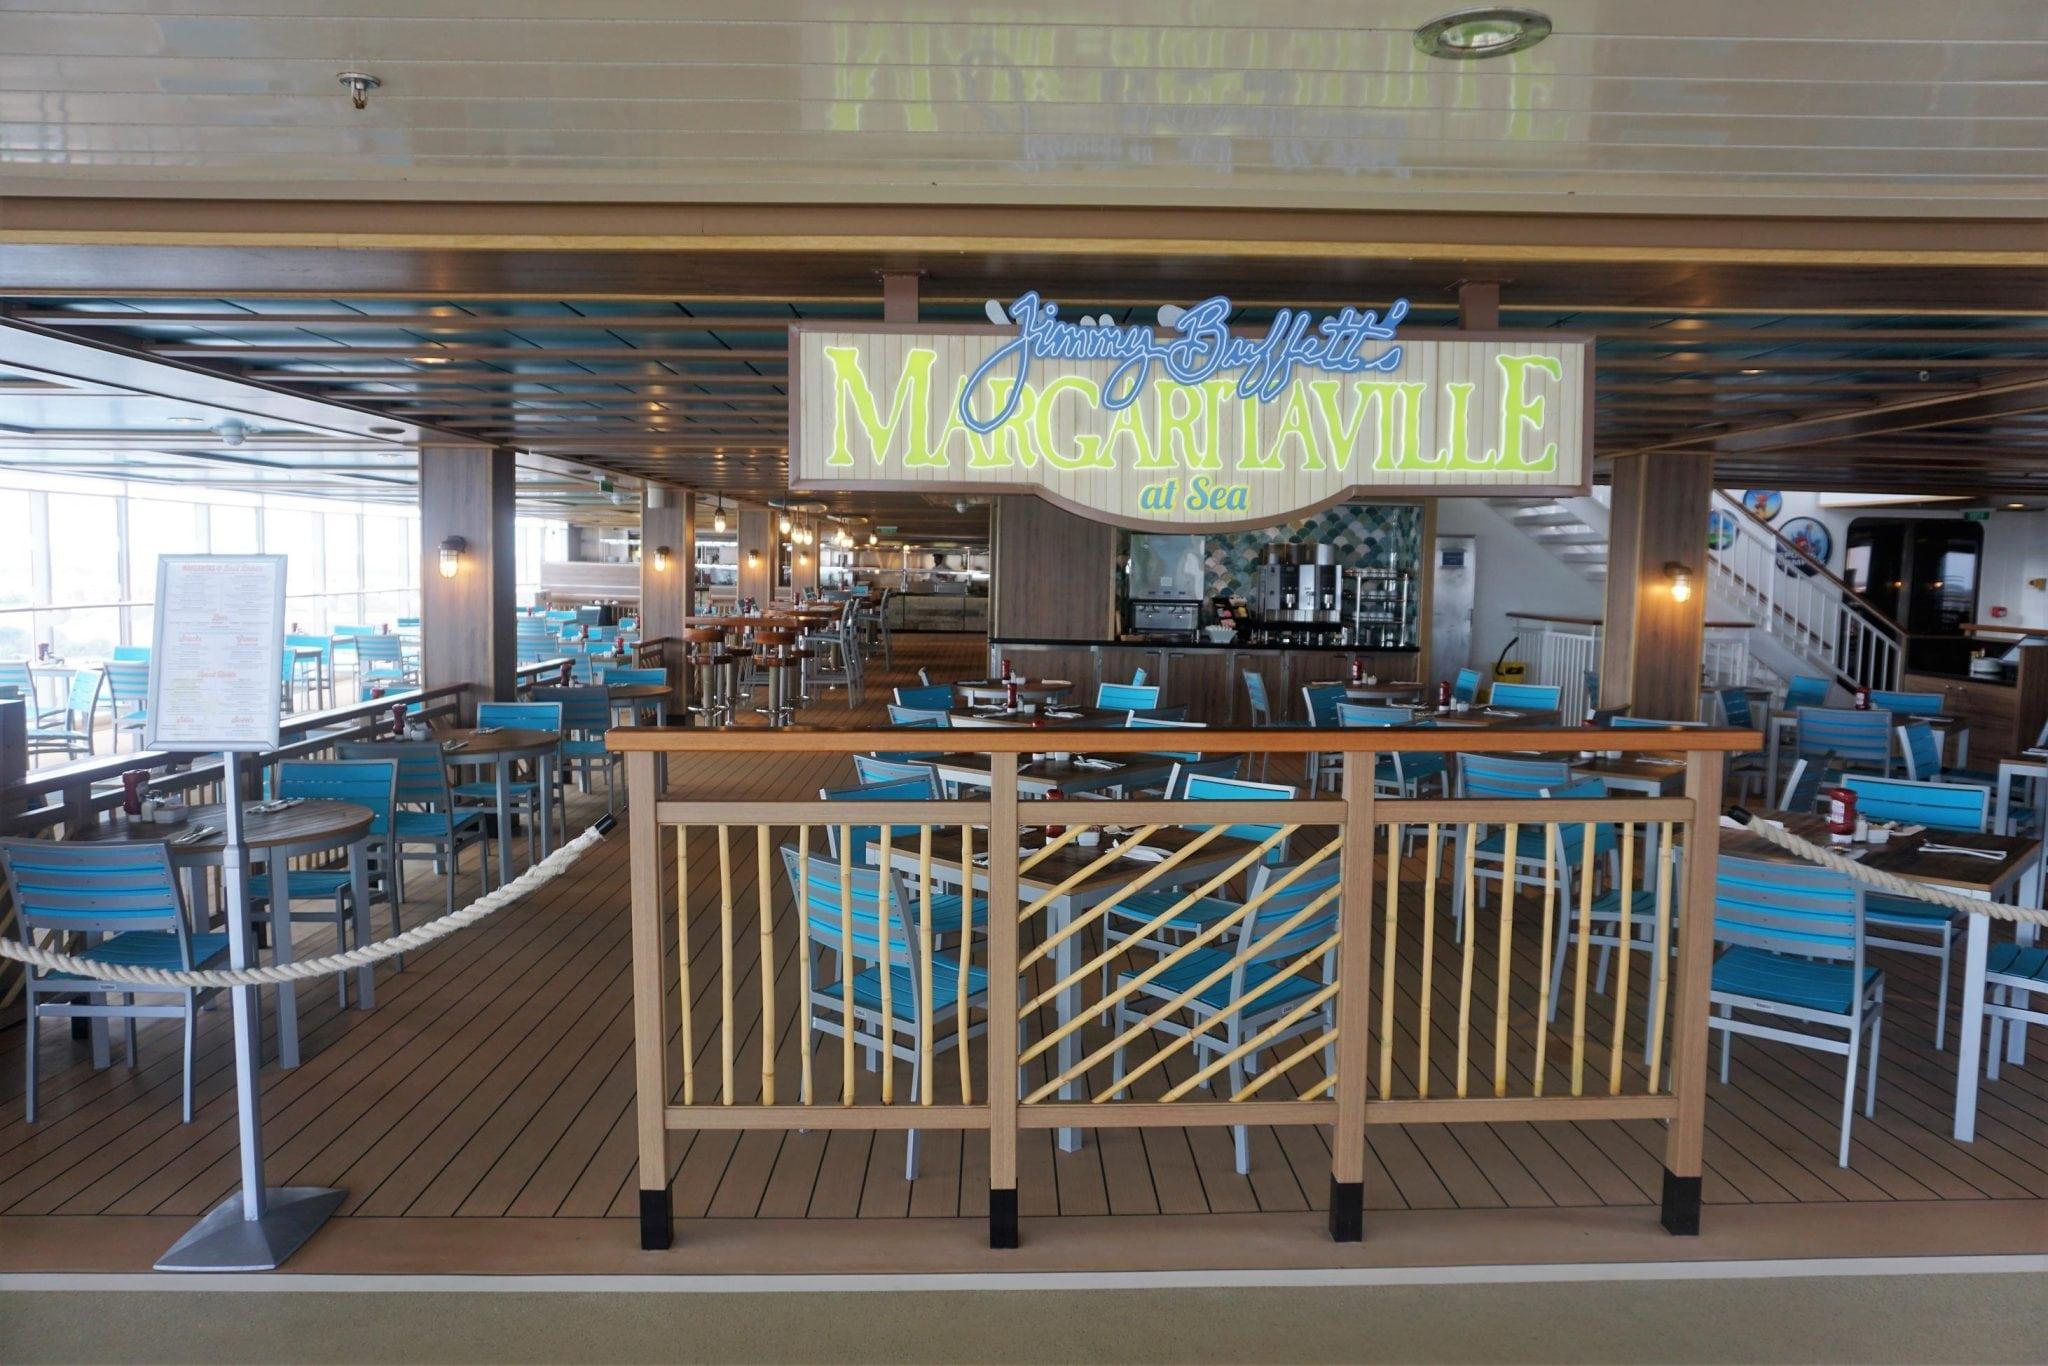 6 Reasons to Visit Margaritaville on Norwegian Getaway